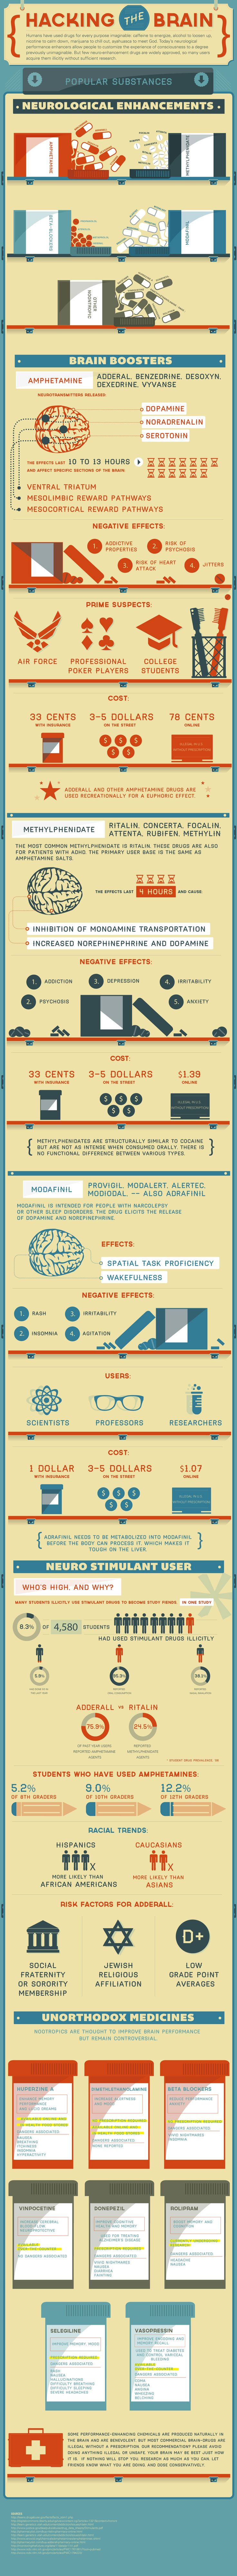 Hacking the Brain